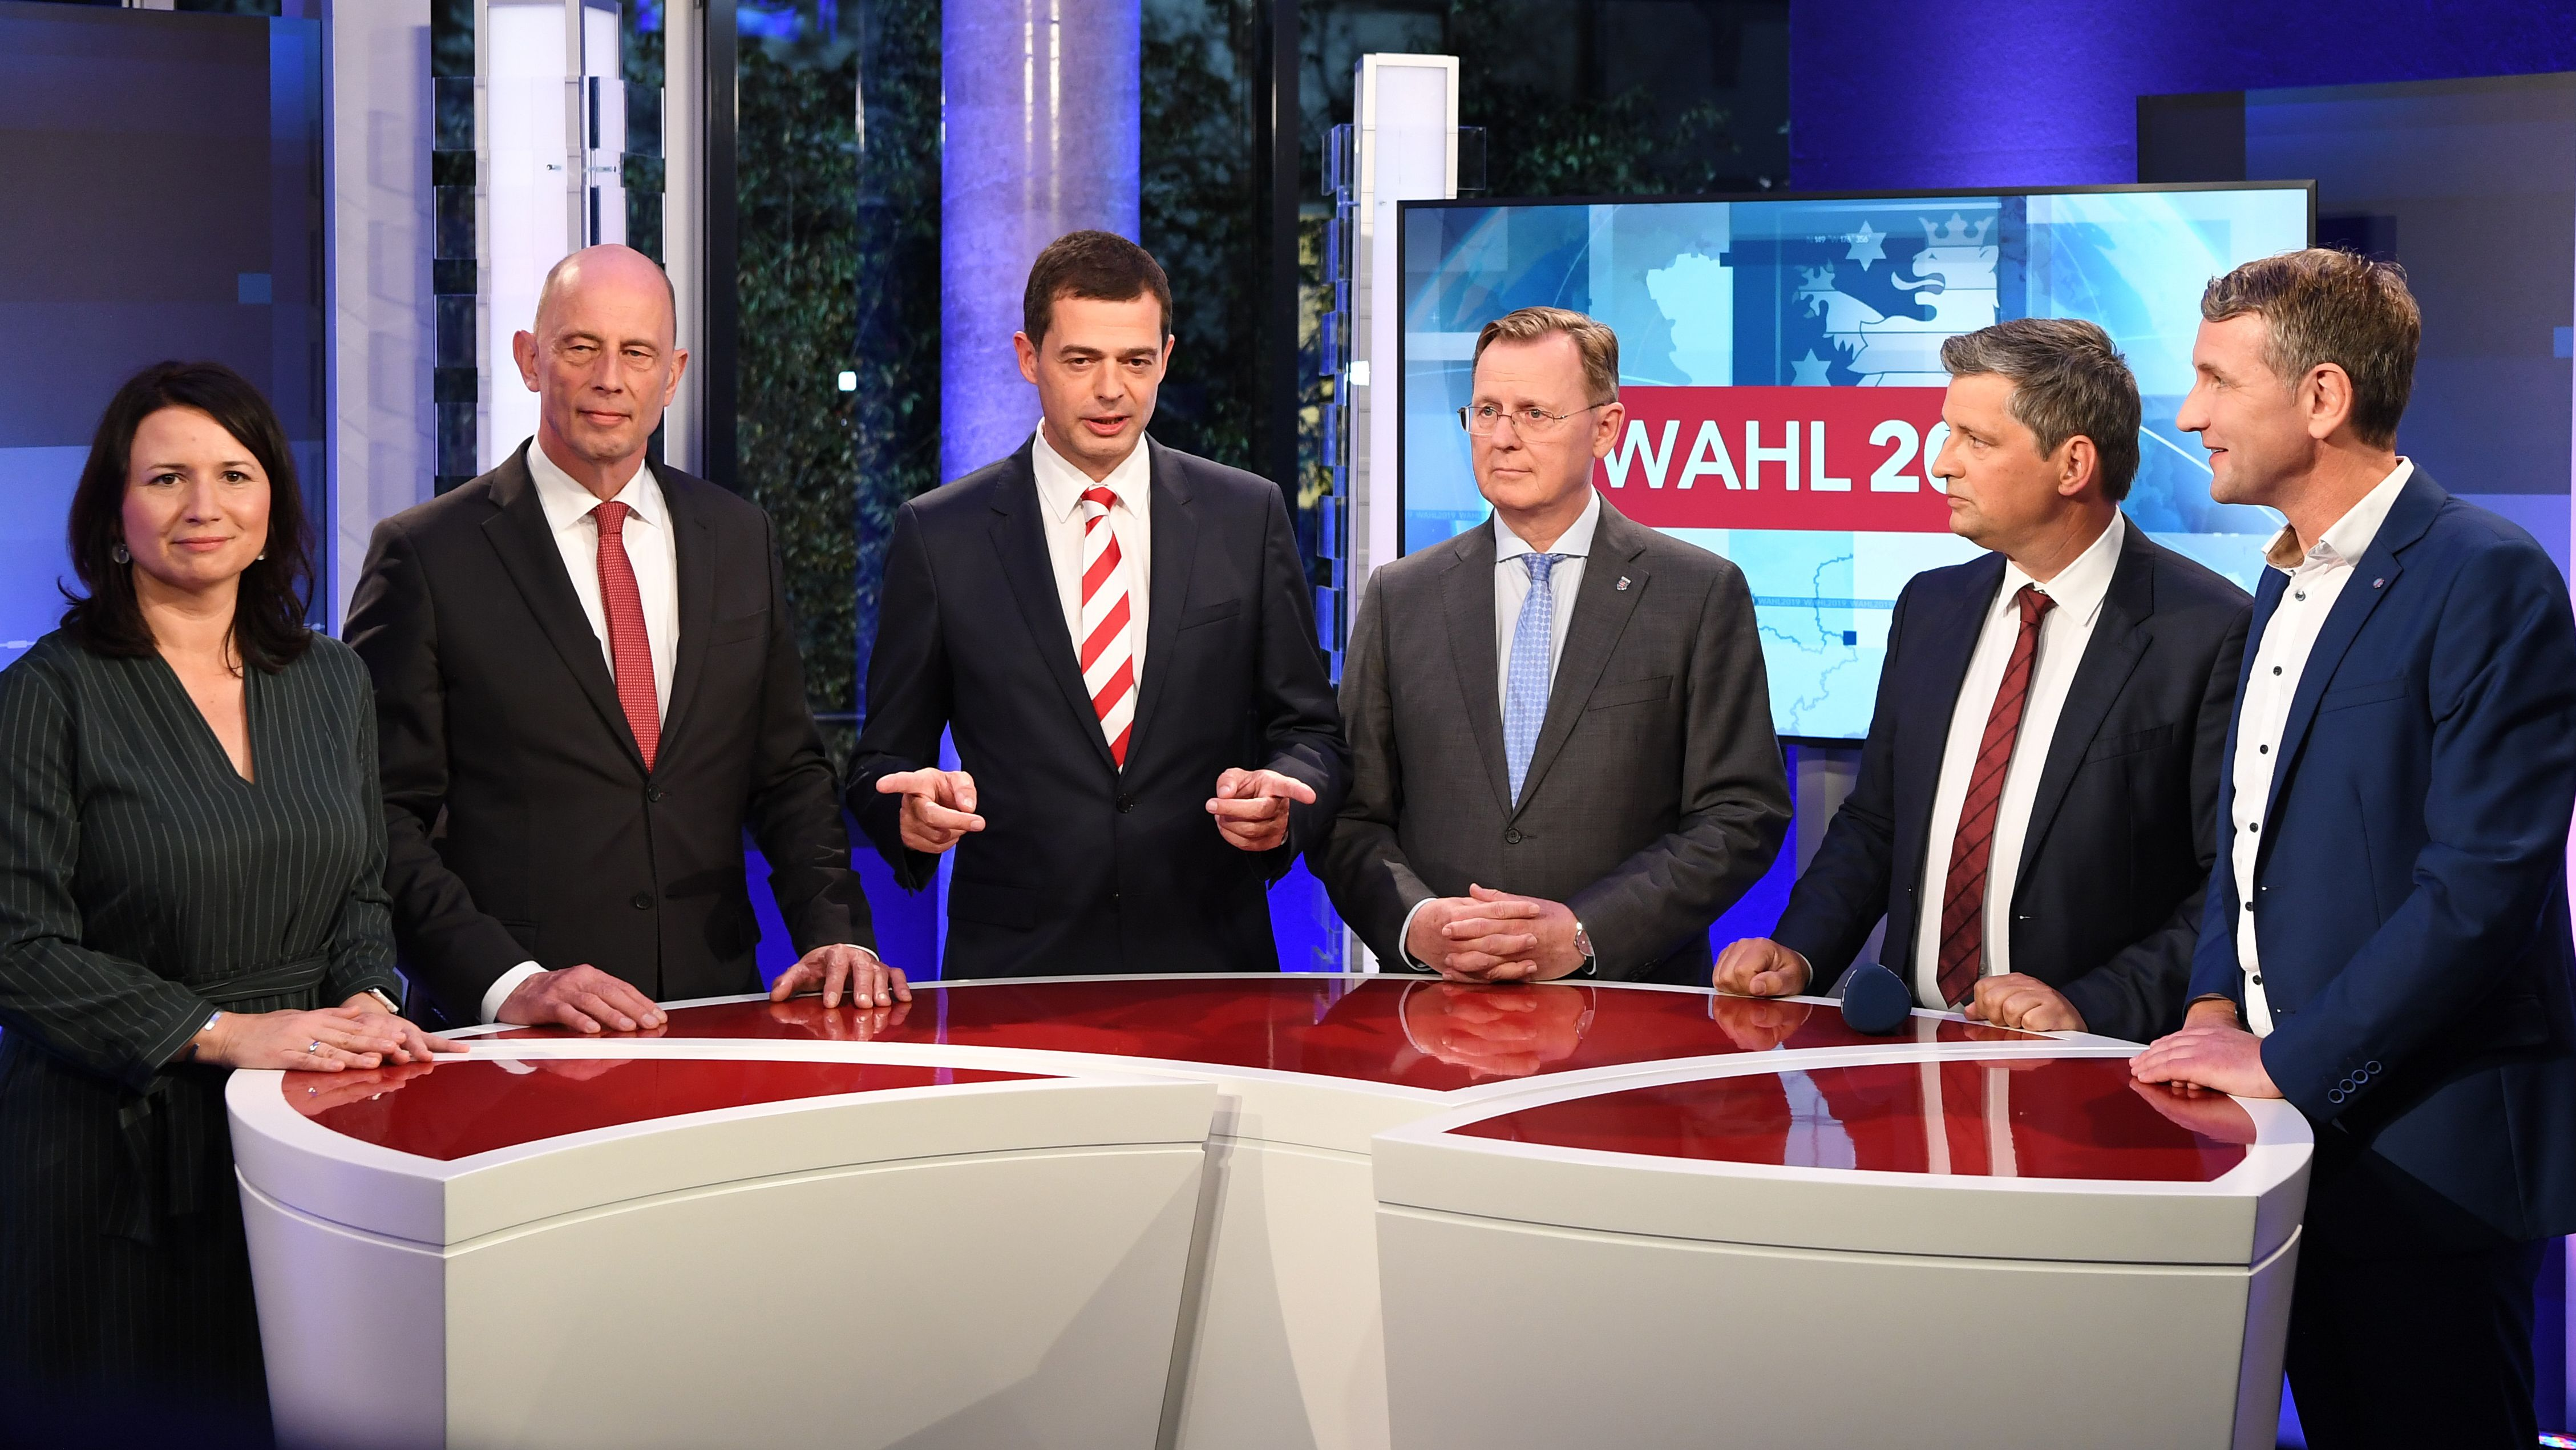 Anja Siegesmund (Grüne), Wolfgang Tiefensee (SPD), Mike Mohring (CDU), Bodo Ramelow (Die Linke), MDR-Moderator Christian Müller und Björn Höcke (AfD)